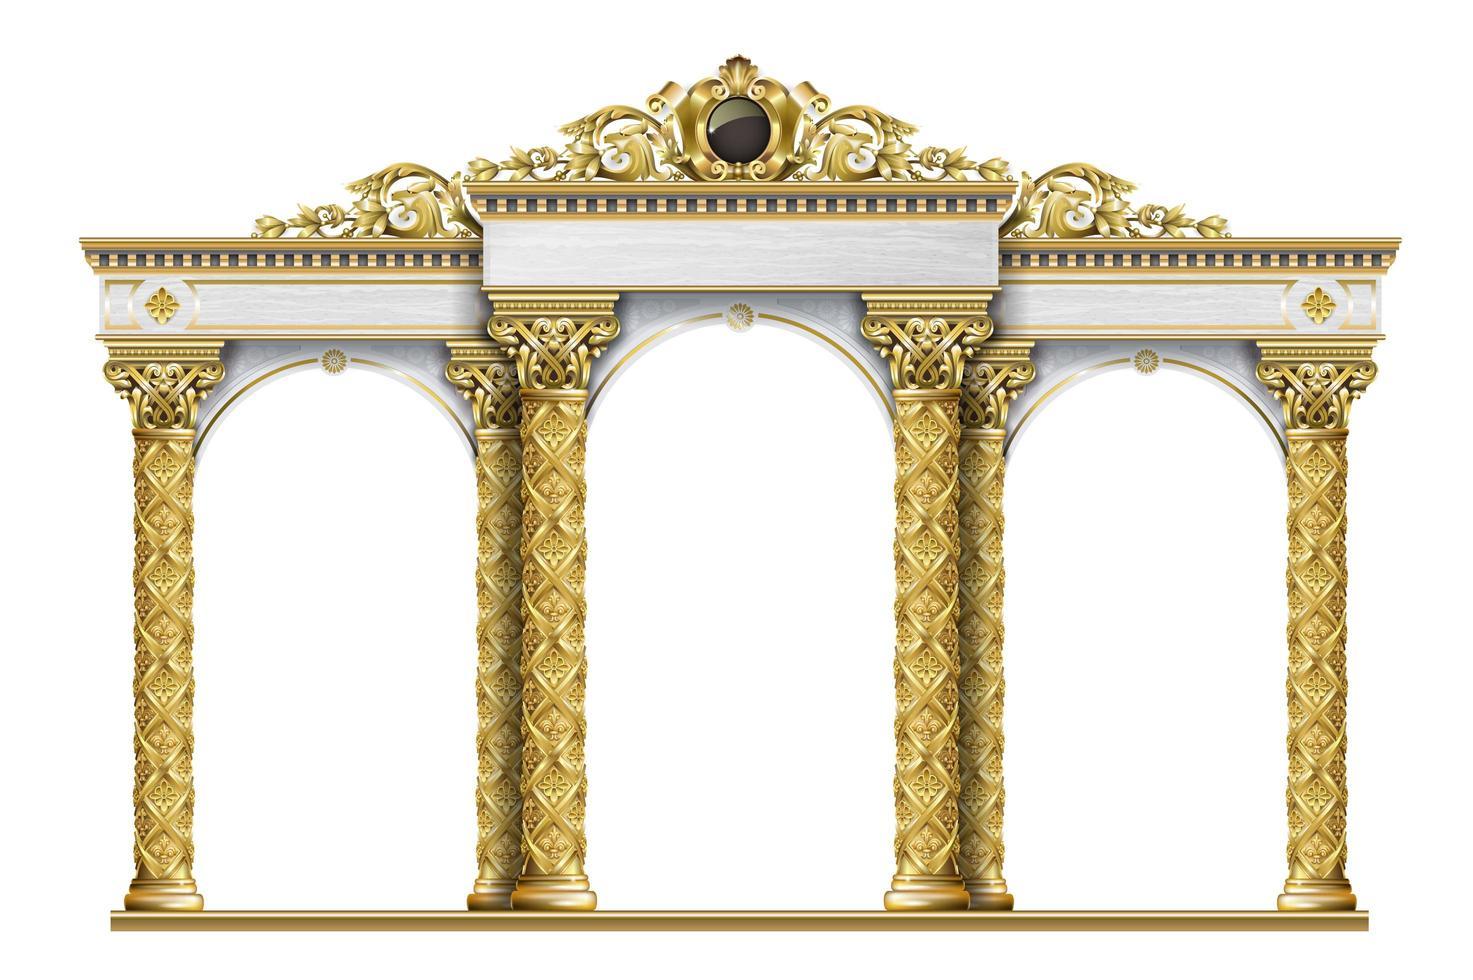 arco clássico de luxo antigo vetor